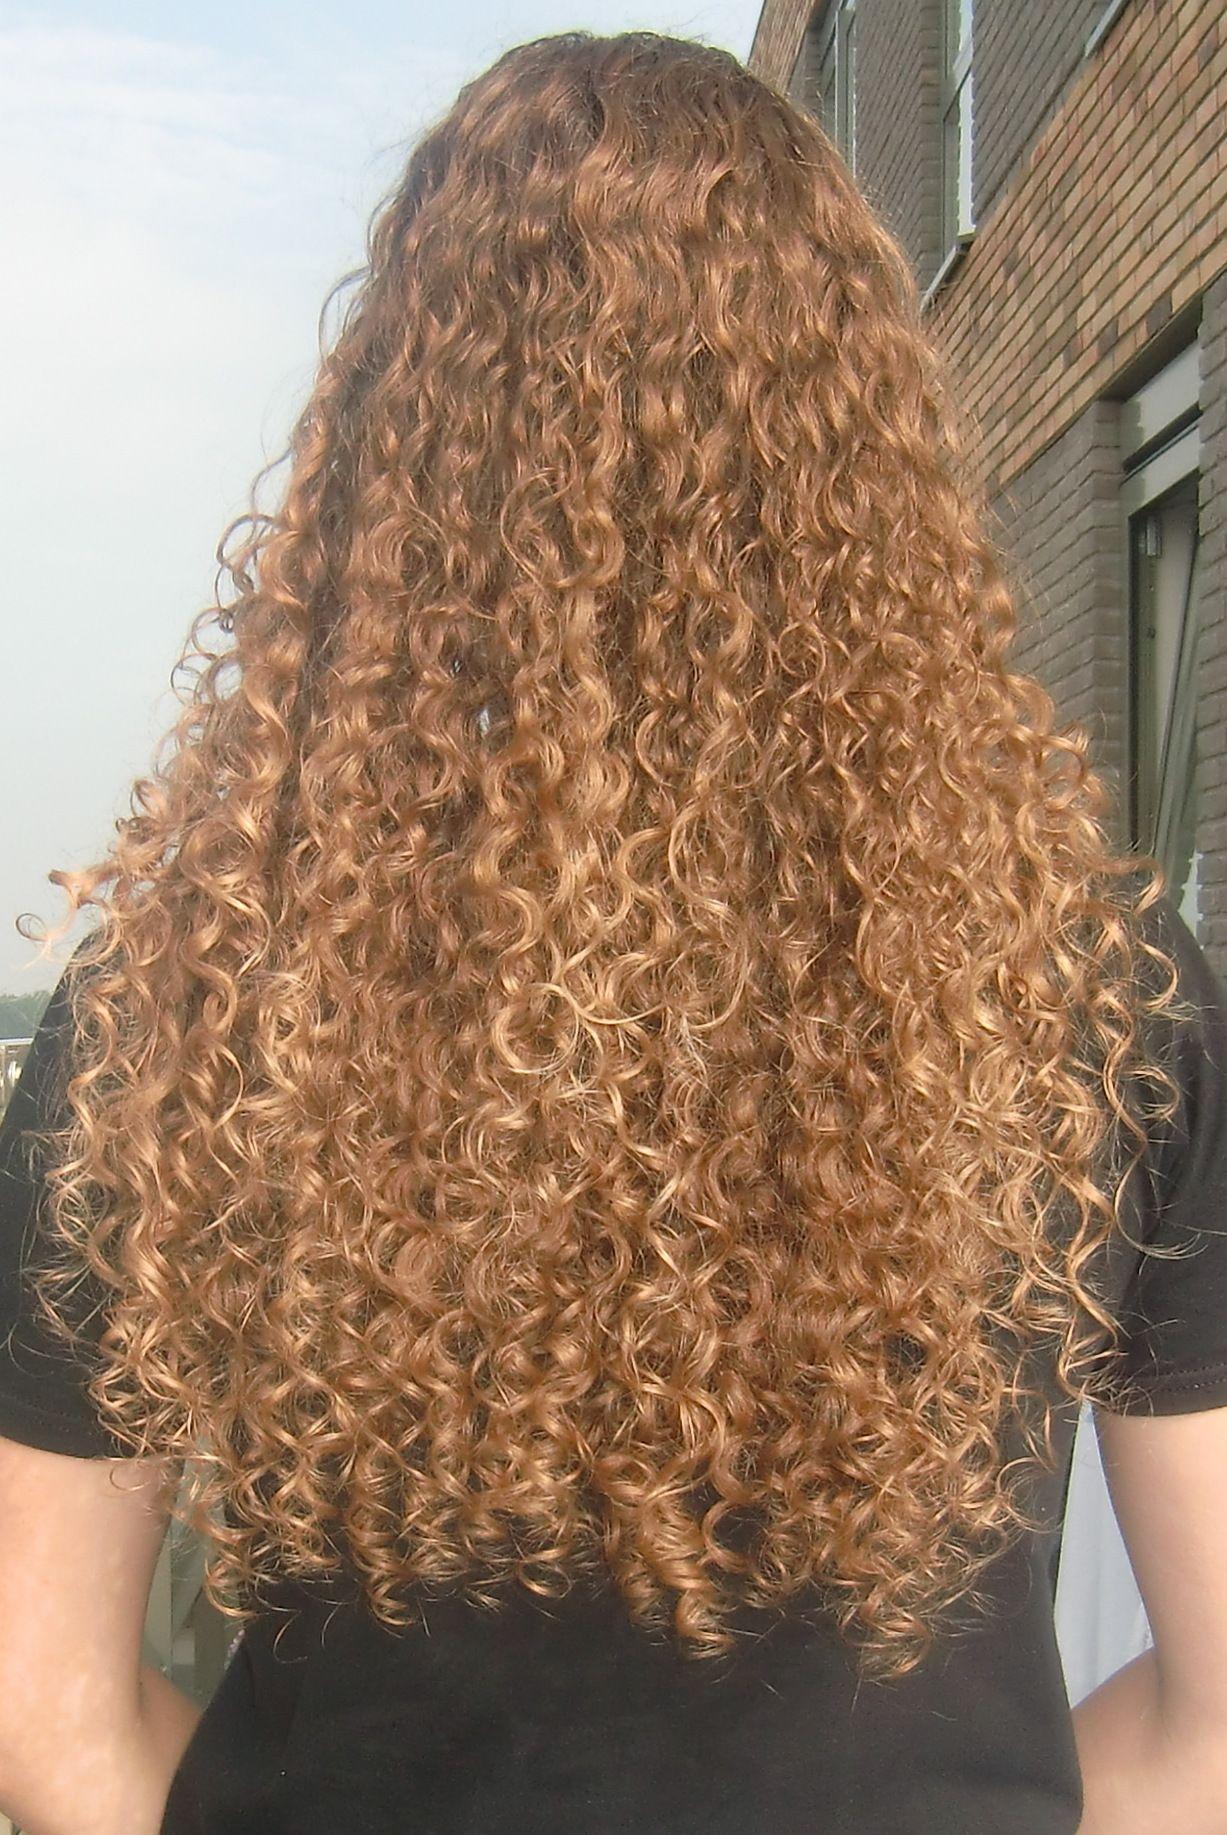 5 Ways to Style Waist Length Hair  wikiHow